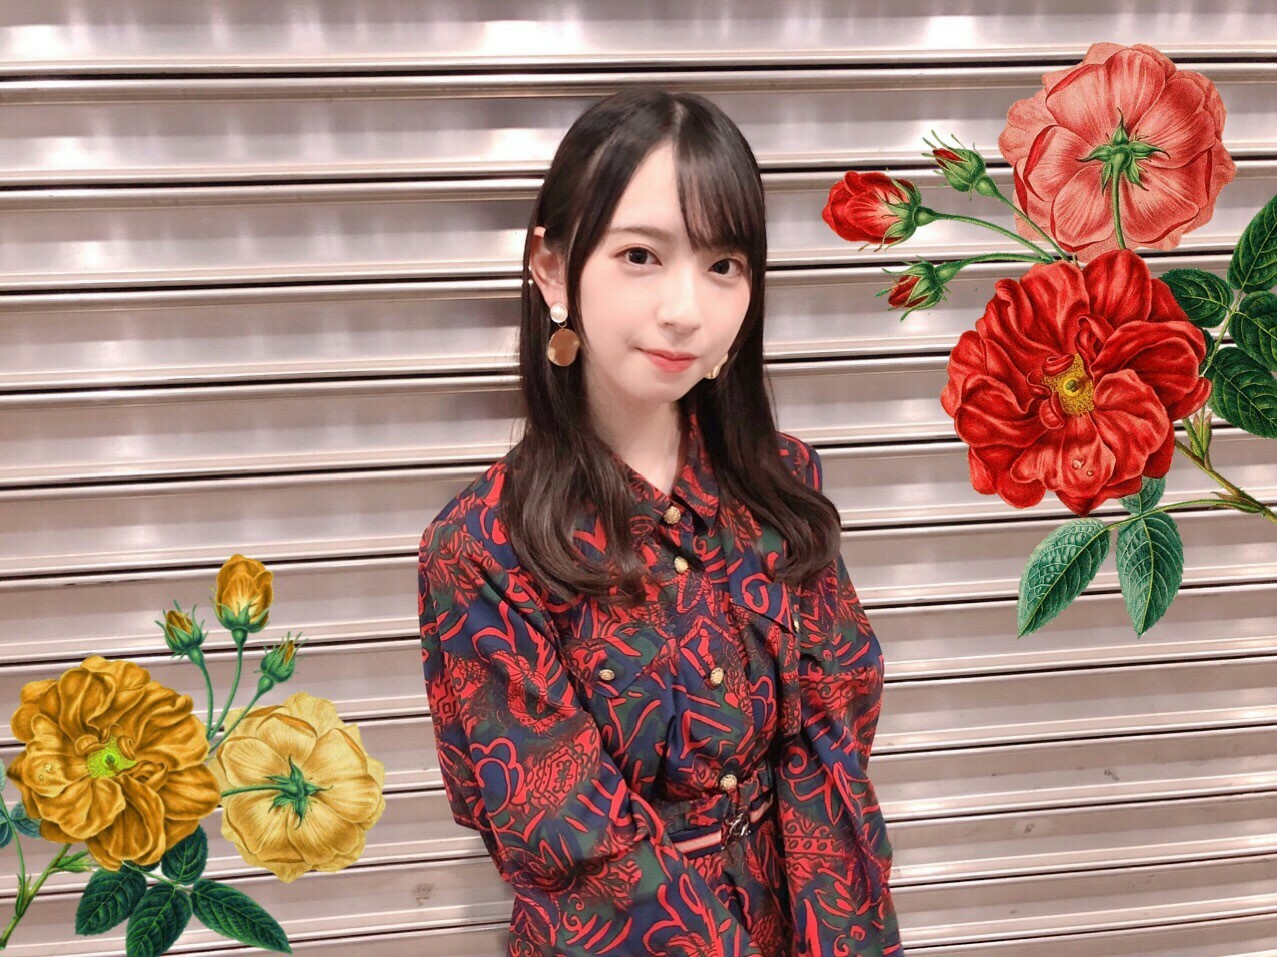 f:id:asitaha46:20181018204836j:image